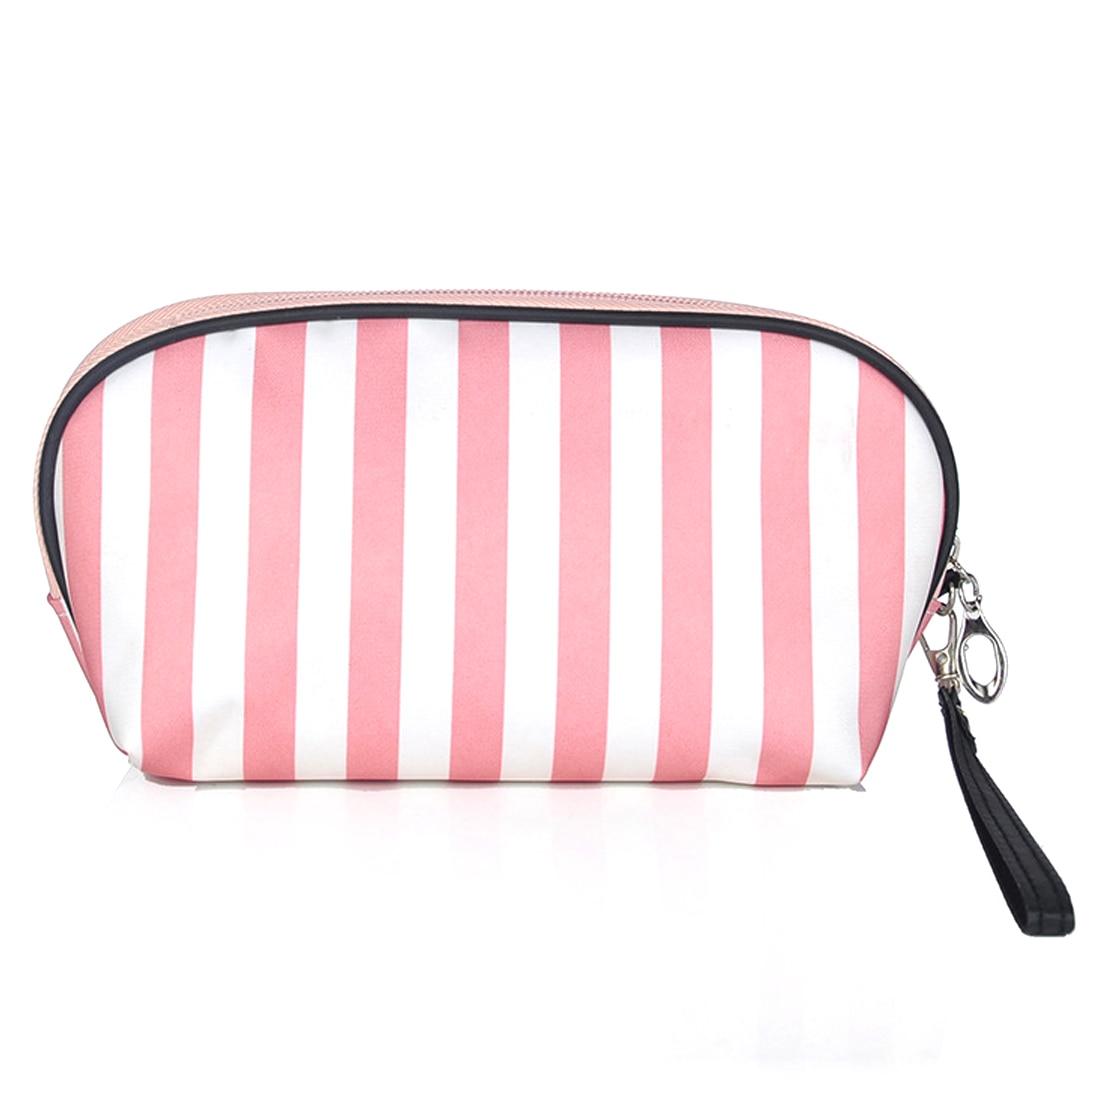 Mini Women Bag With Stripe Pattern Waterproof Semicircle Cosmetic Bag Travelling Toiletries Storage Bag Make Up Case Bag Hot Kit